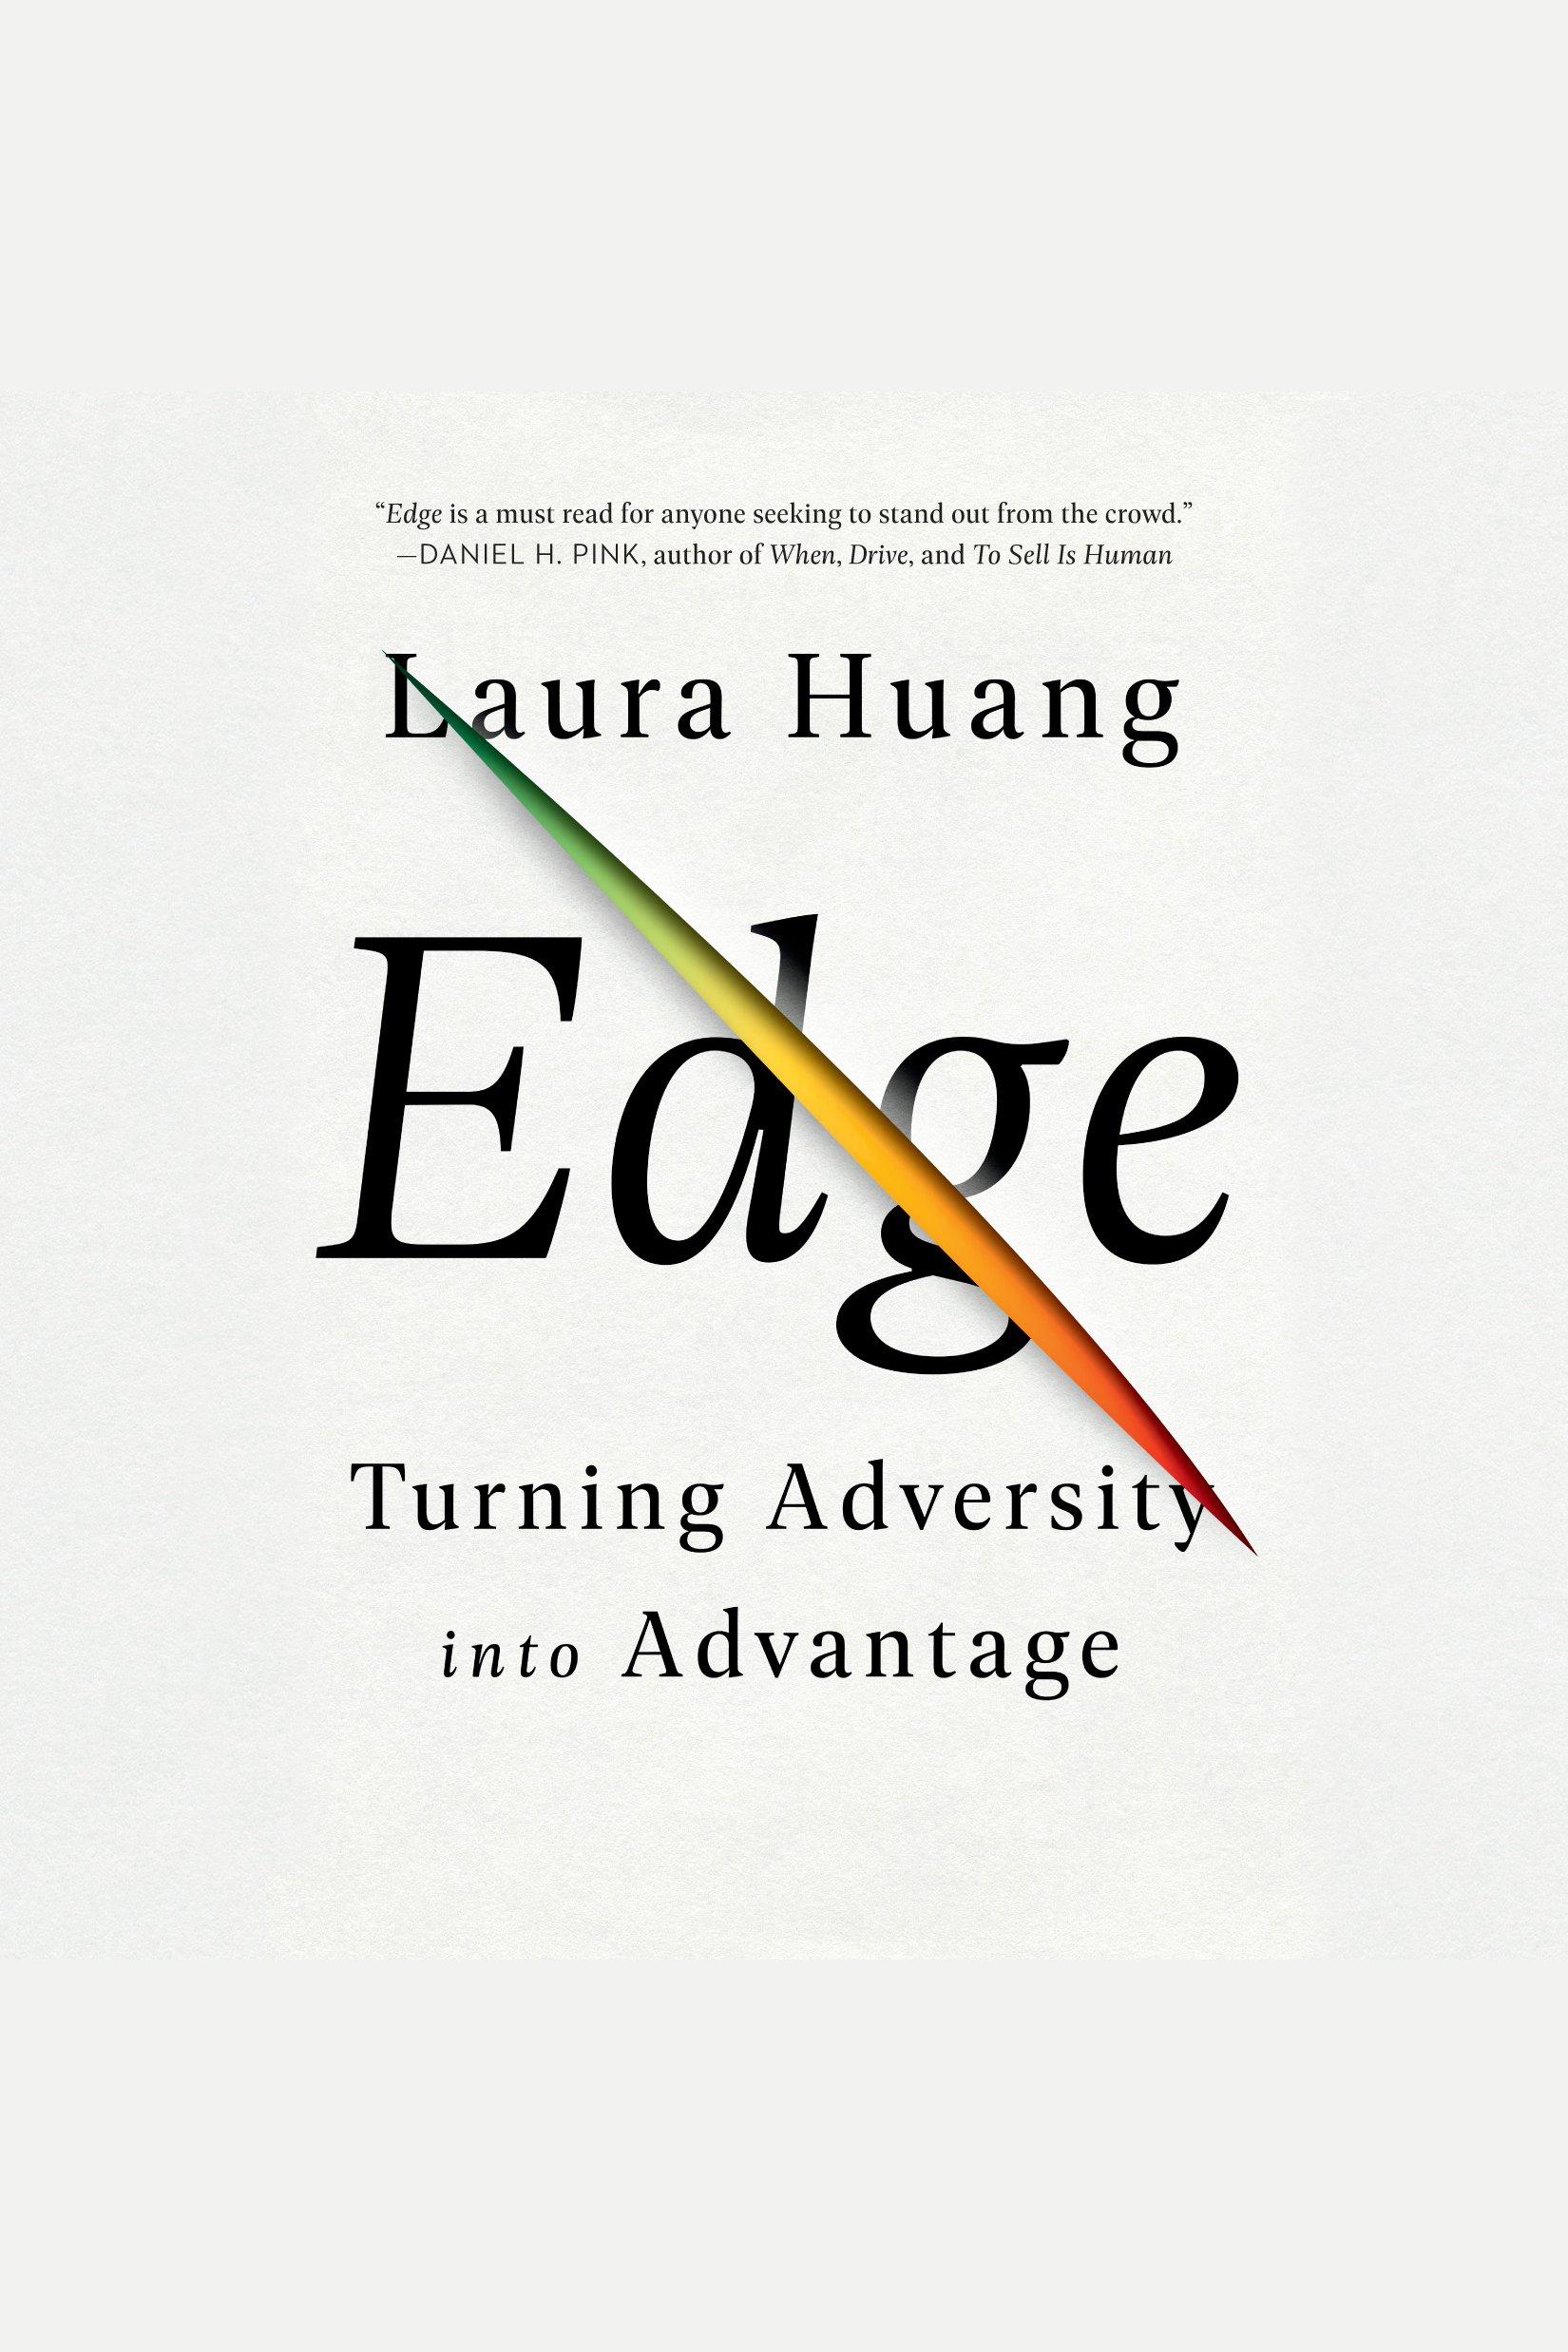 Edge Turning Adversity into Advantage